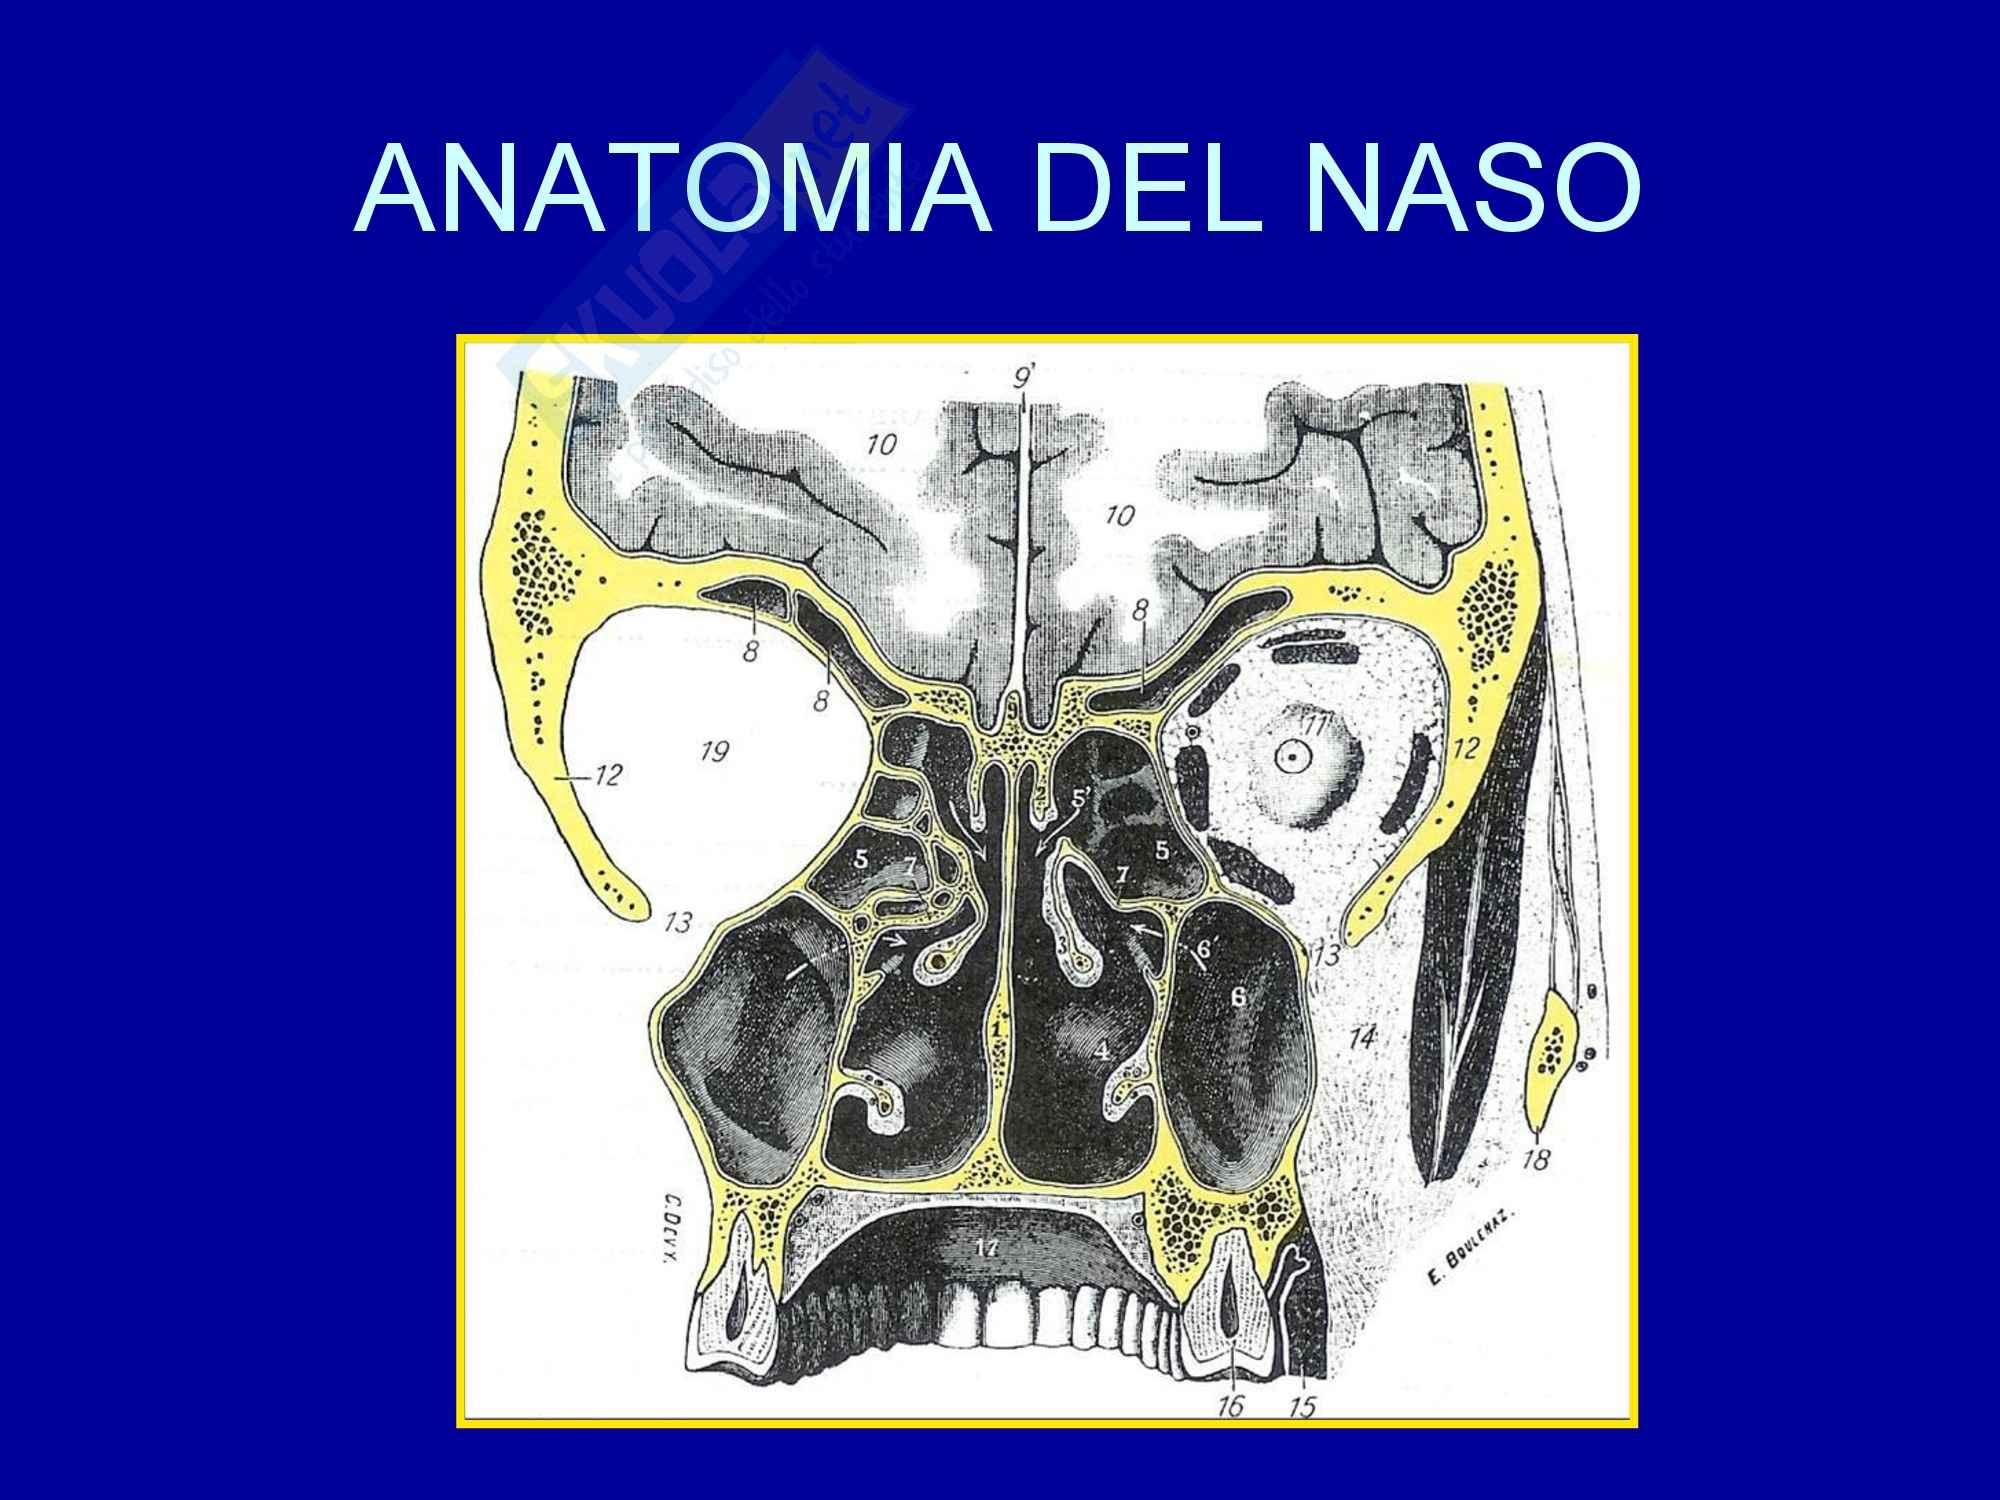 dispensa P. Cassano Otorinolaringoiatria